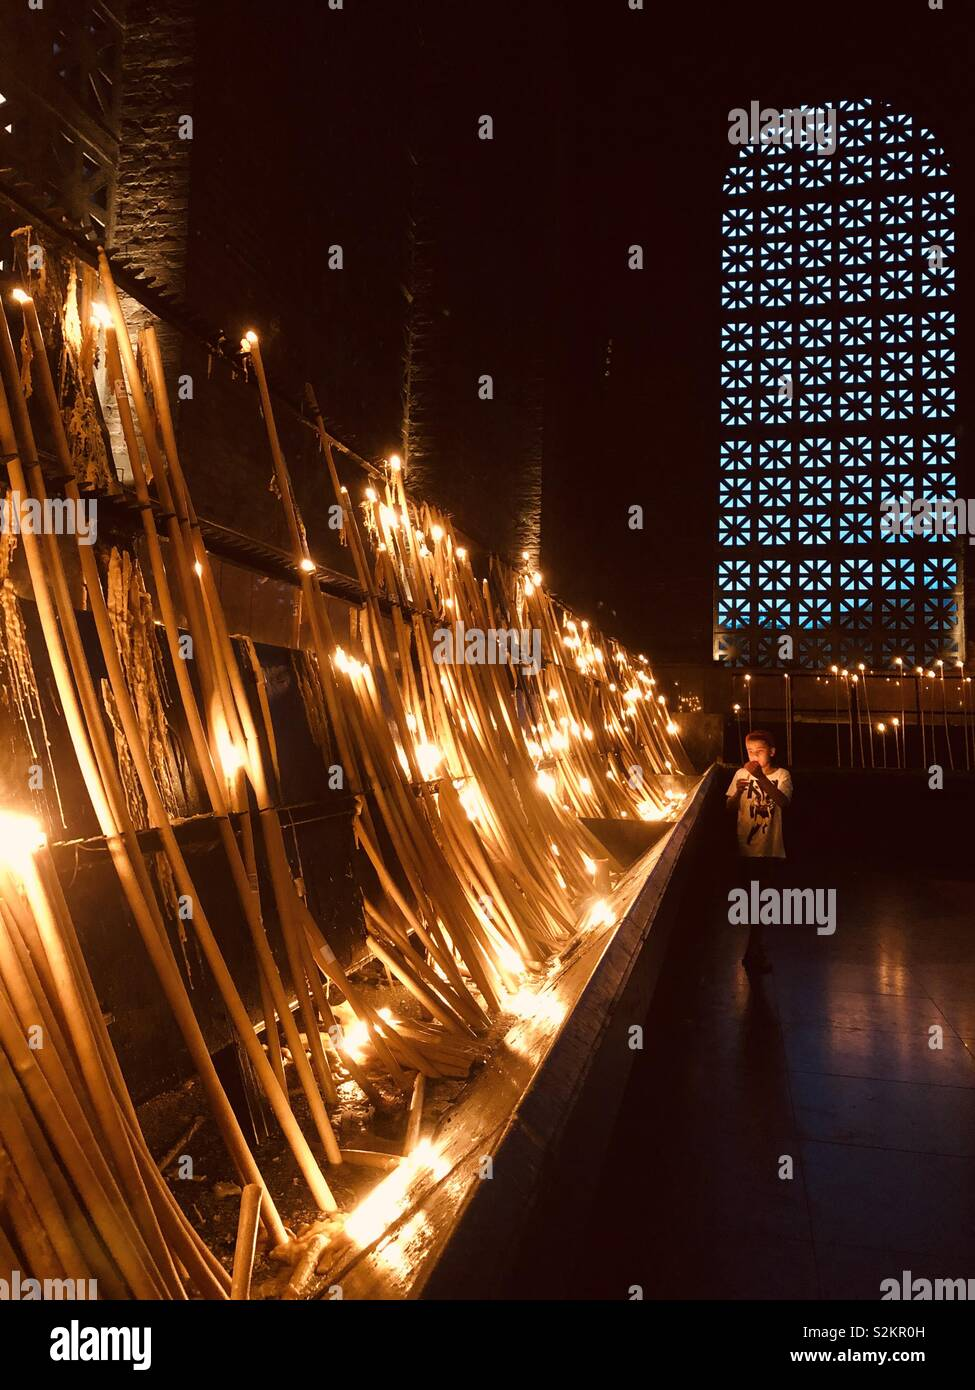 Lights of faith Stock Photo